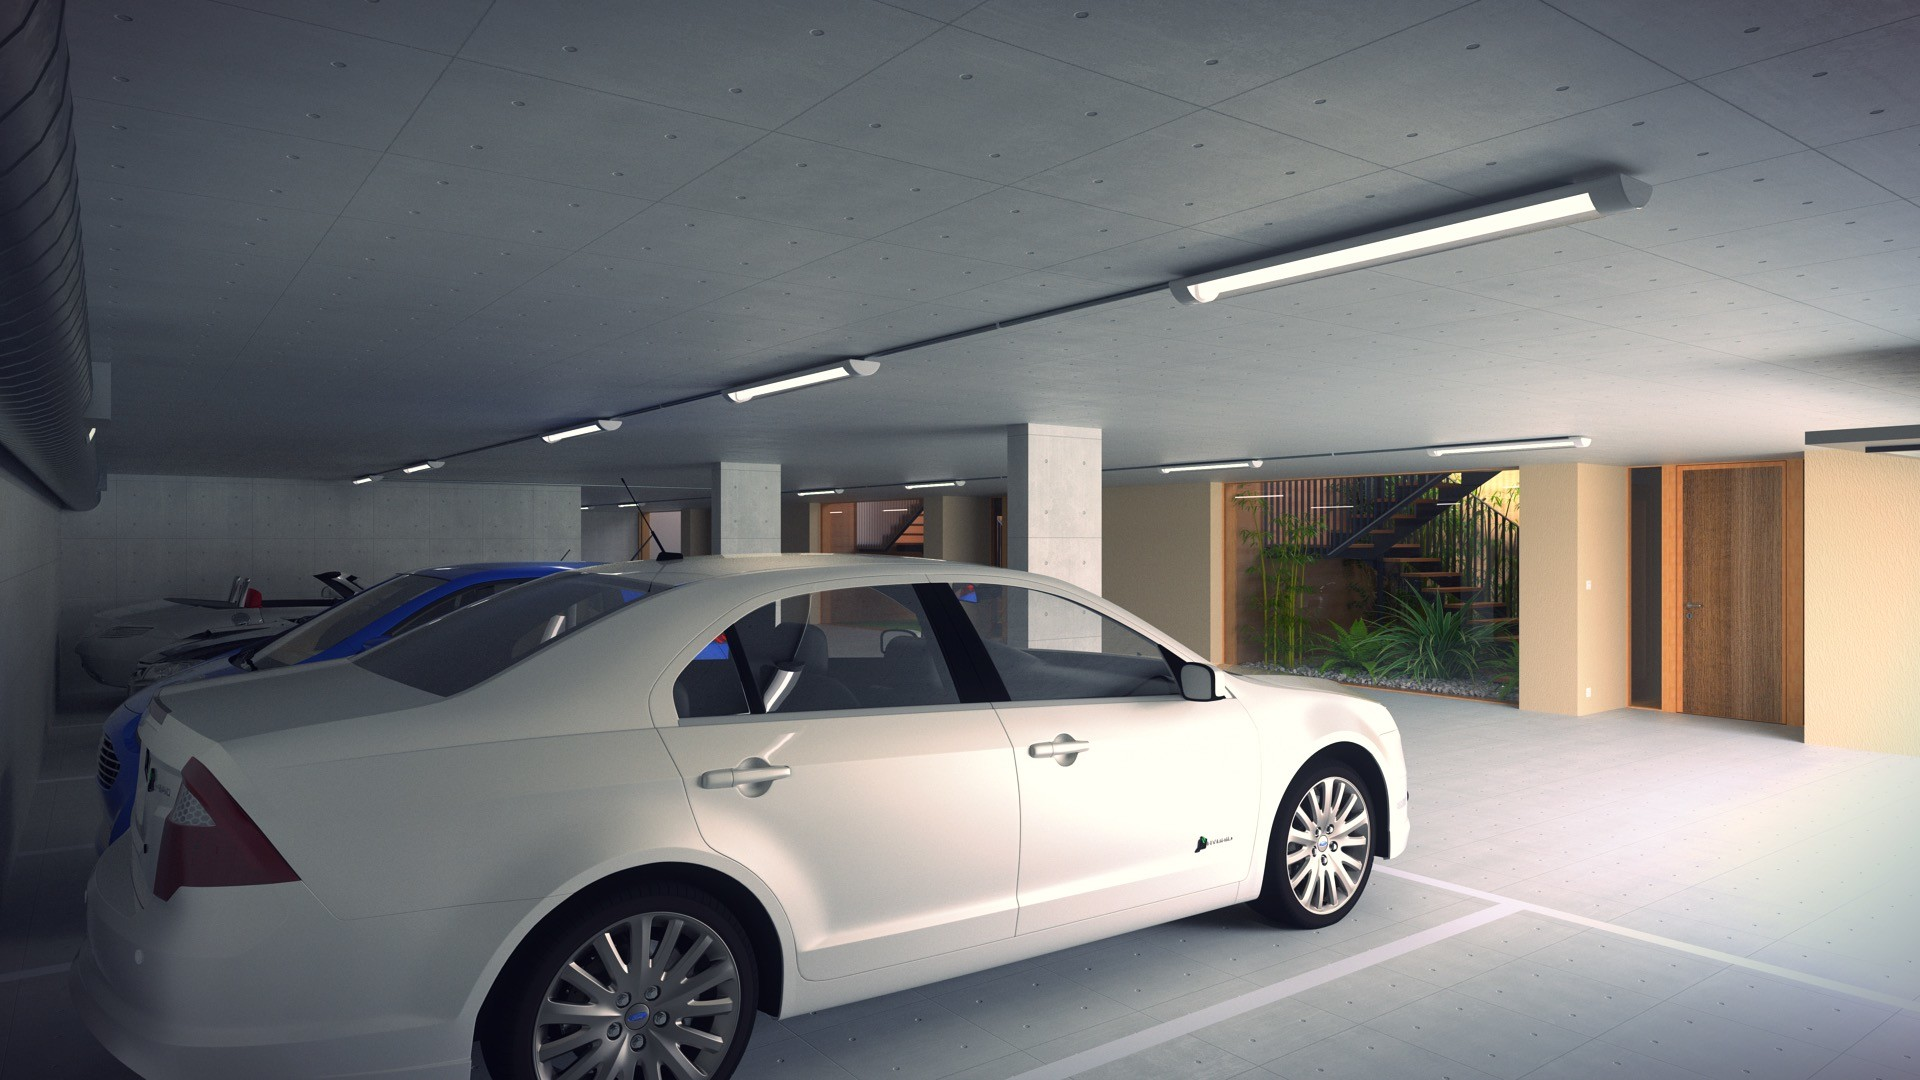 Duane kemp 22 a1309 villas portier 3d staircase garage garage se corner 02 open post